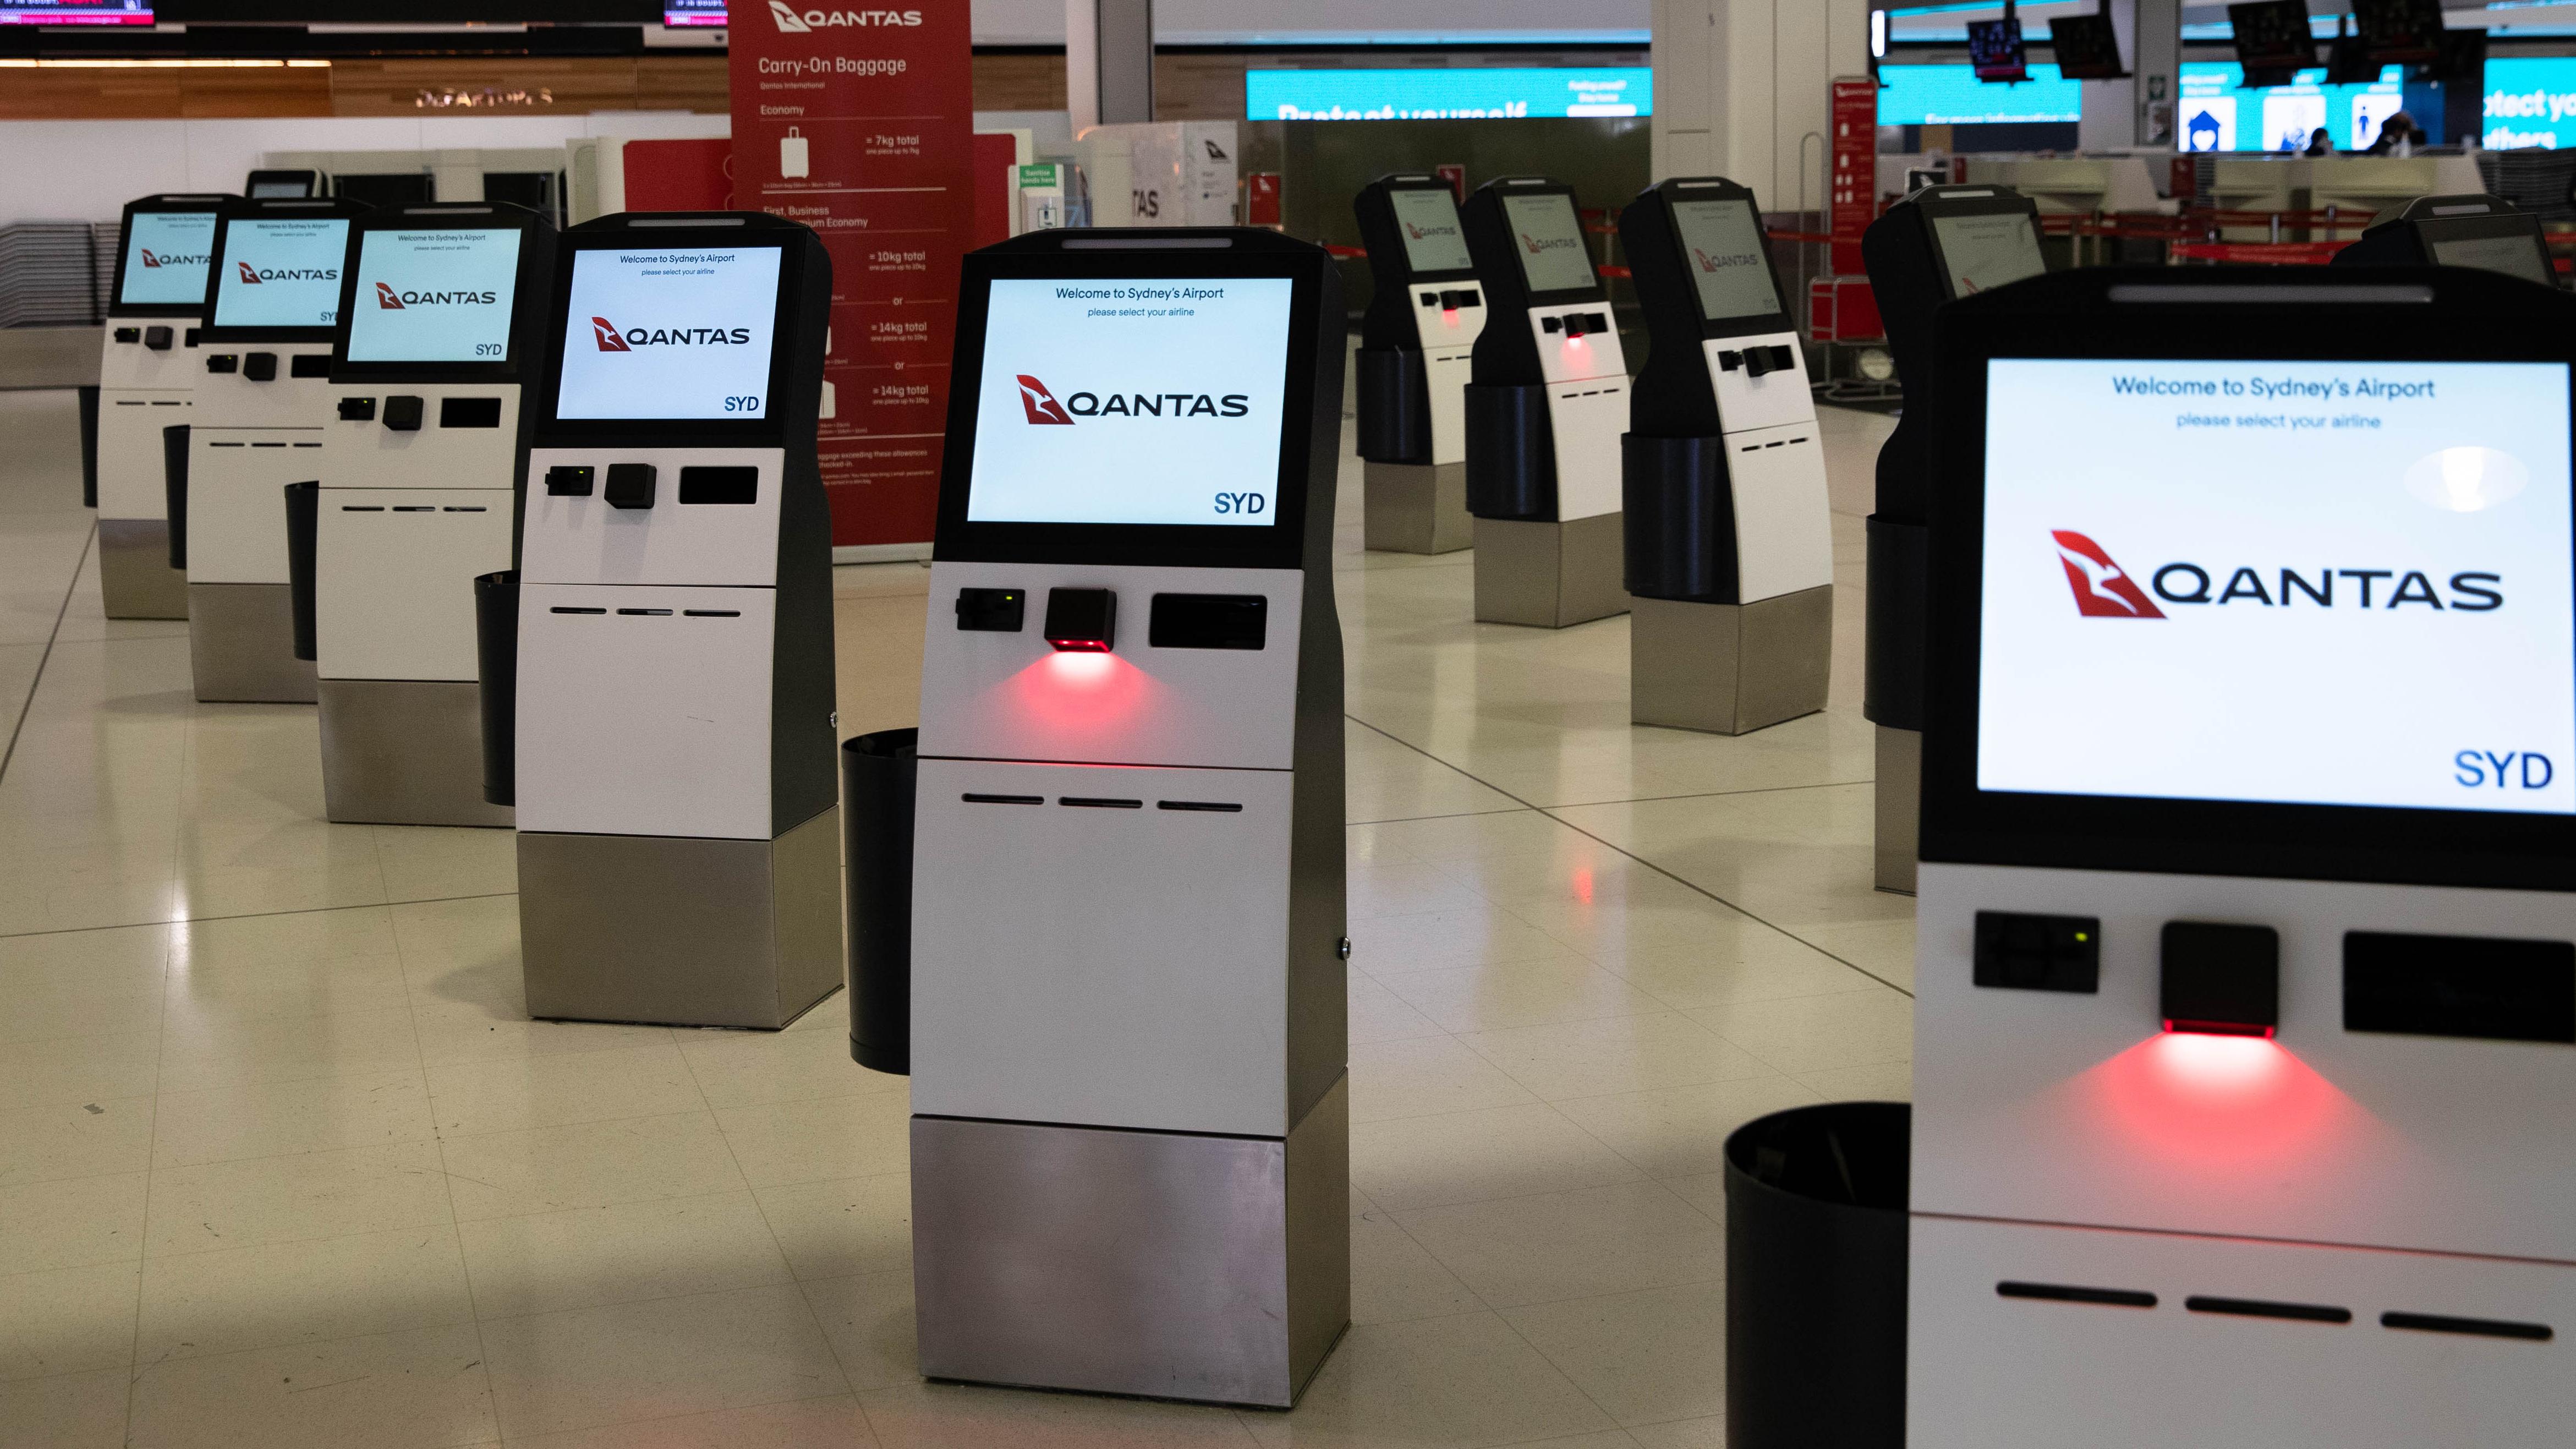 Qantas drops Perth from London route due to WA border closures